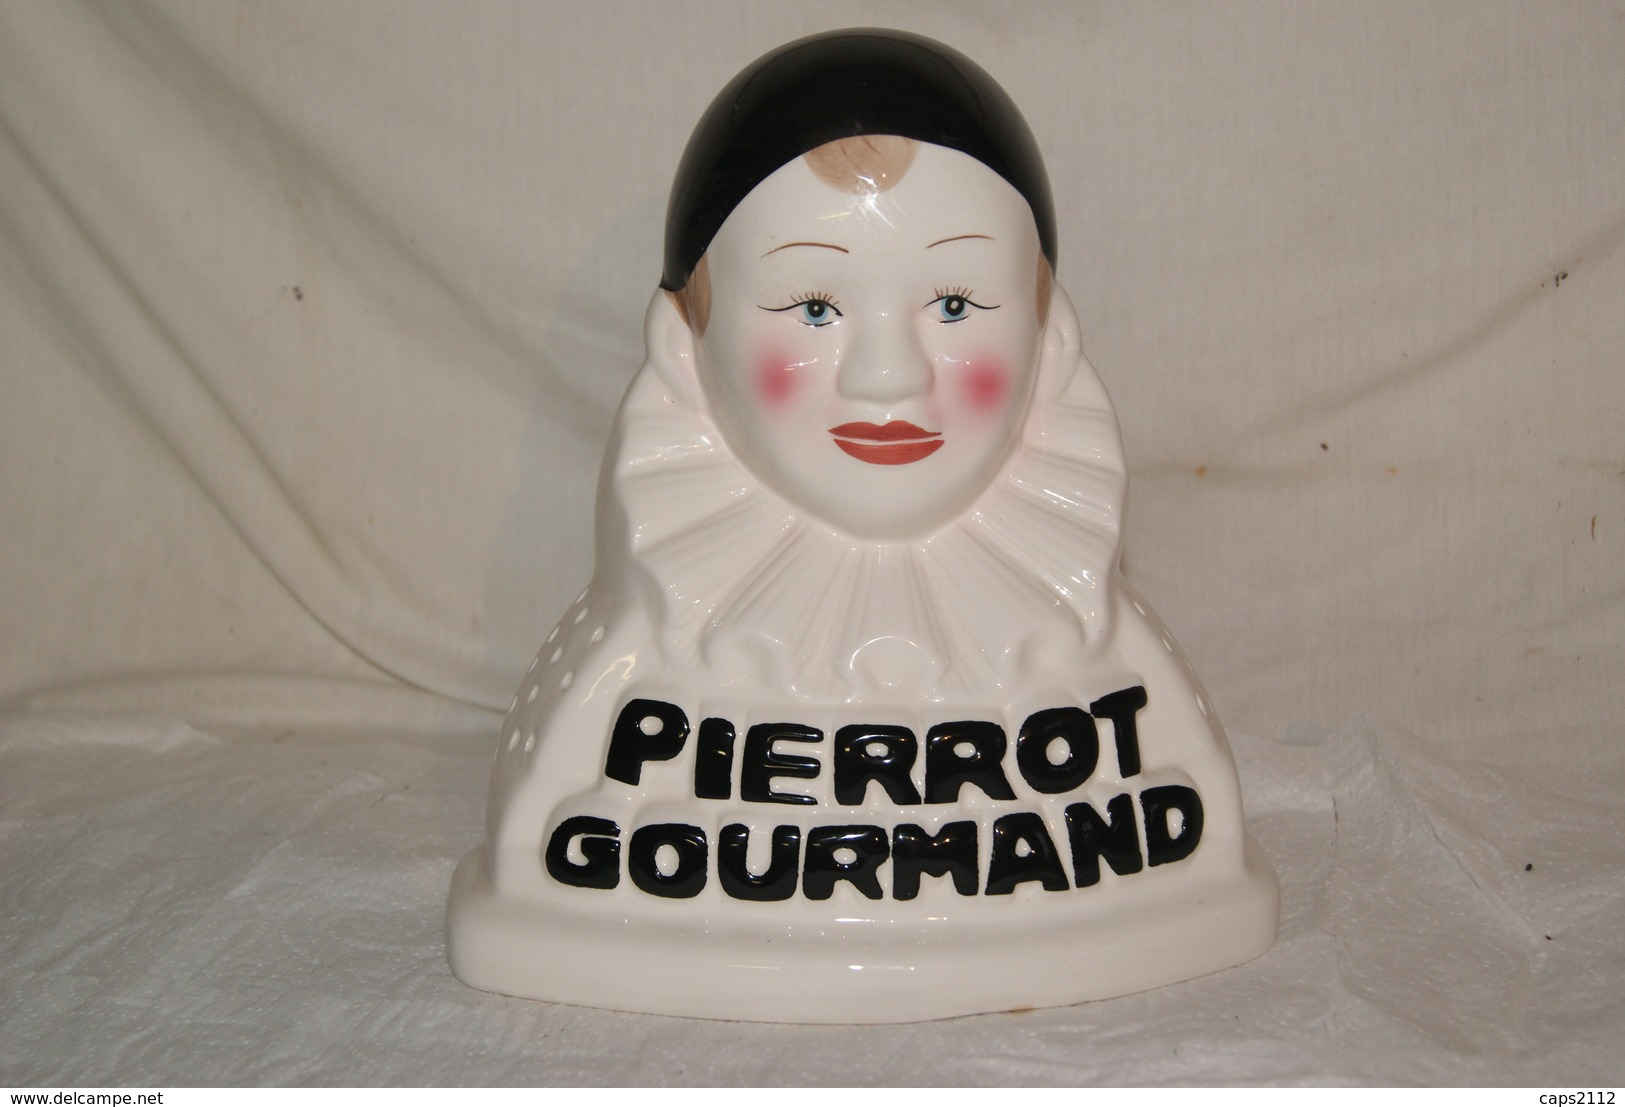 PIERROT GOURMAND - Porte Sucette , Alimentation , Publicite , Faience - Andere